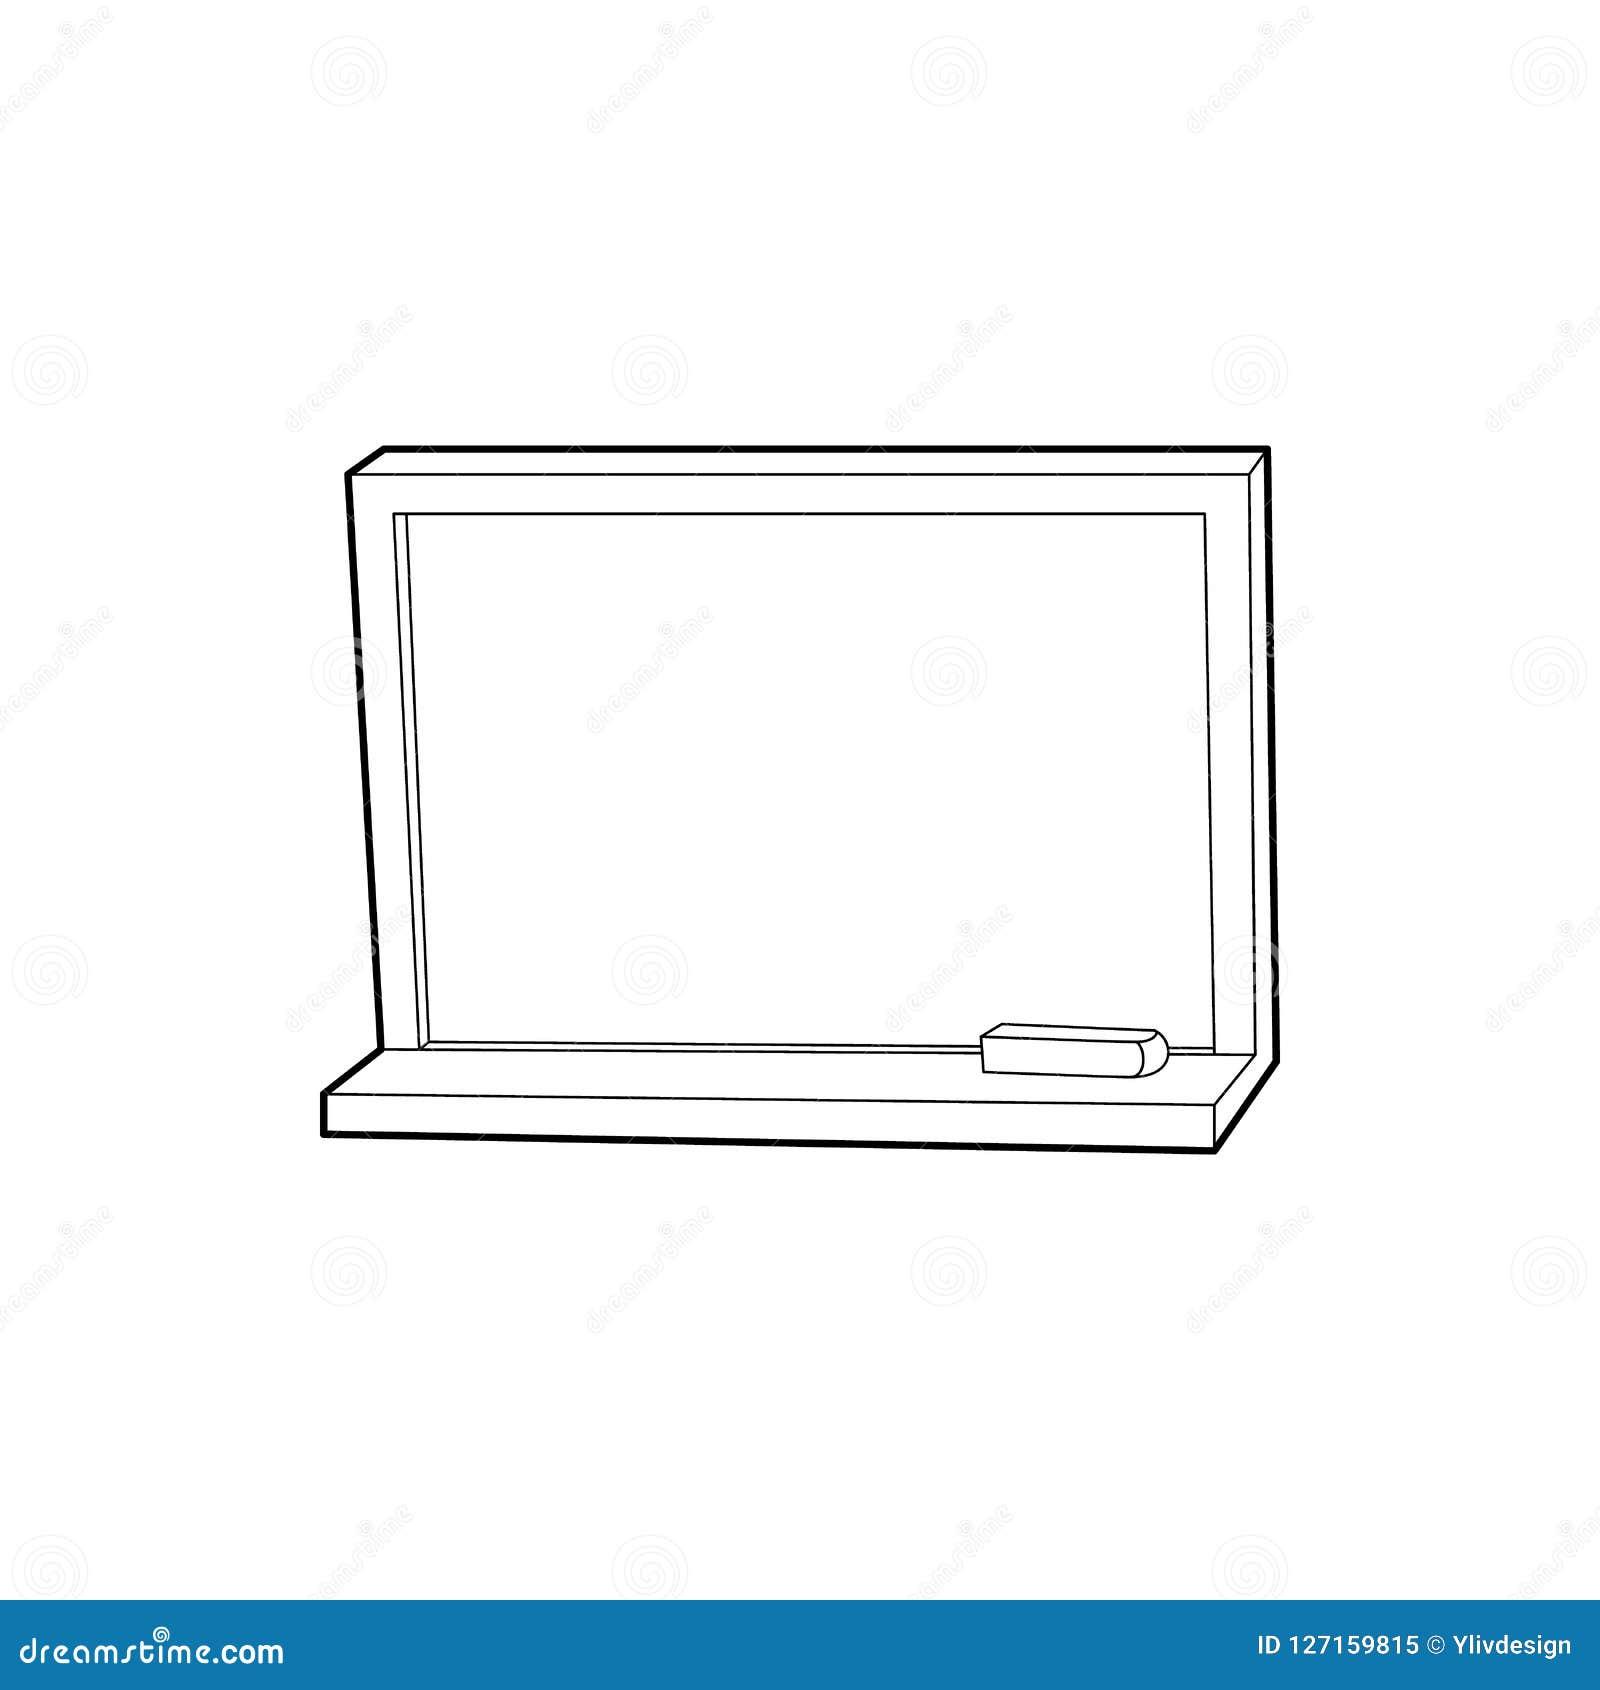 Blackboard z kredową ikoną, konturu styl